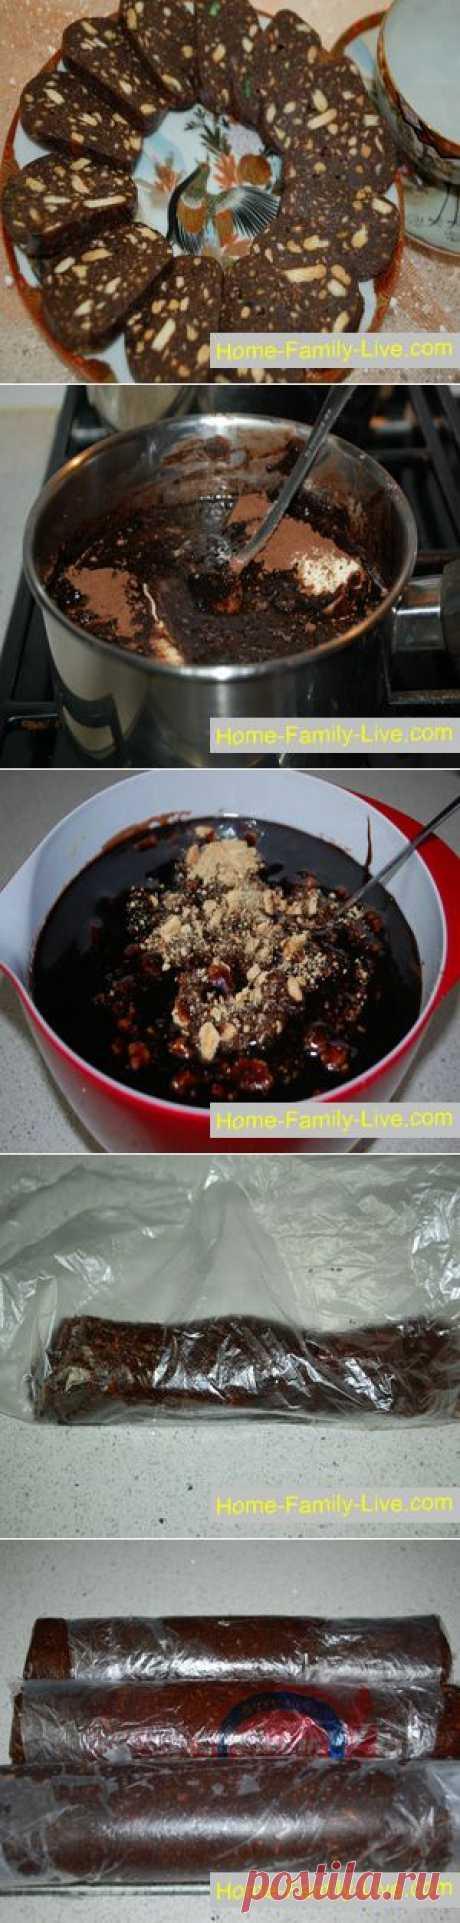 Шоколадная колбаса - Кулинарные рецепты